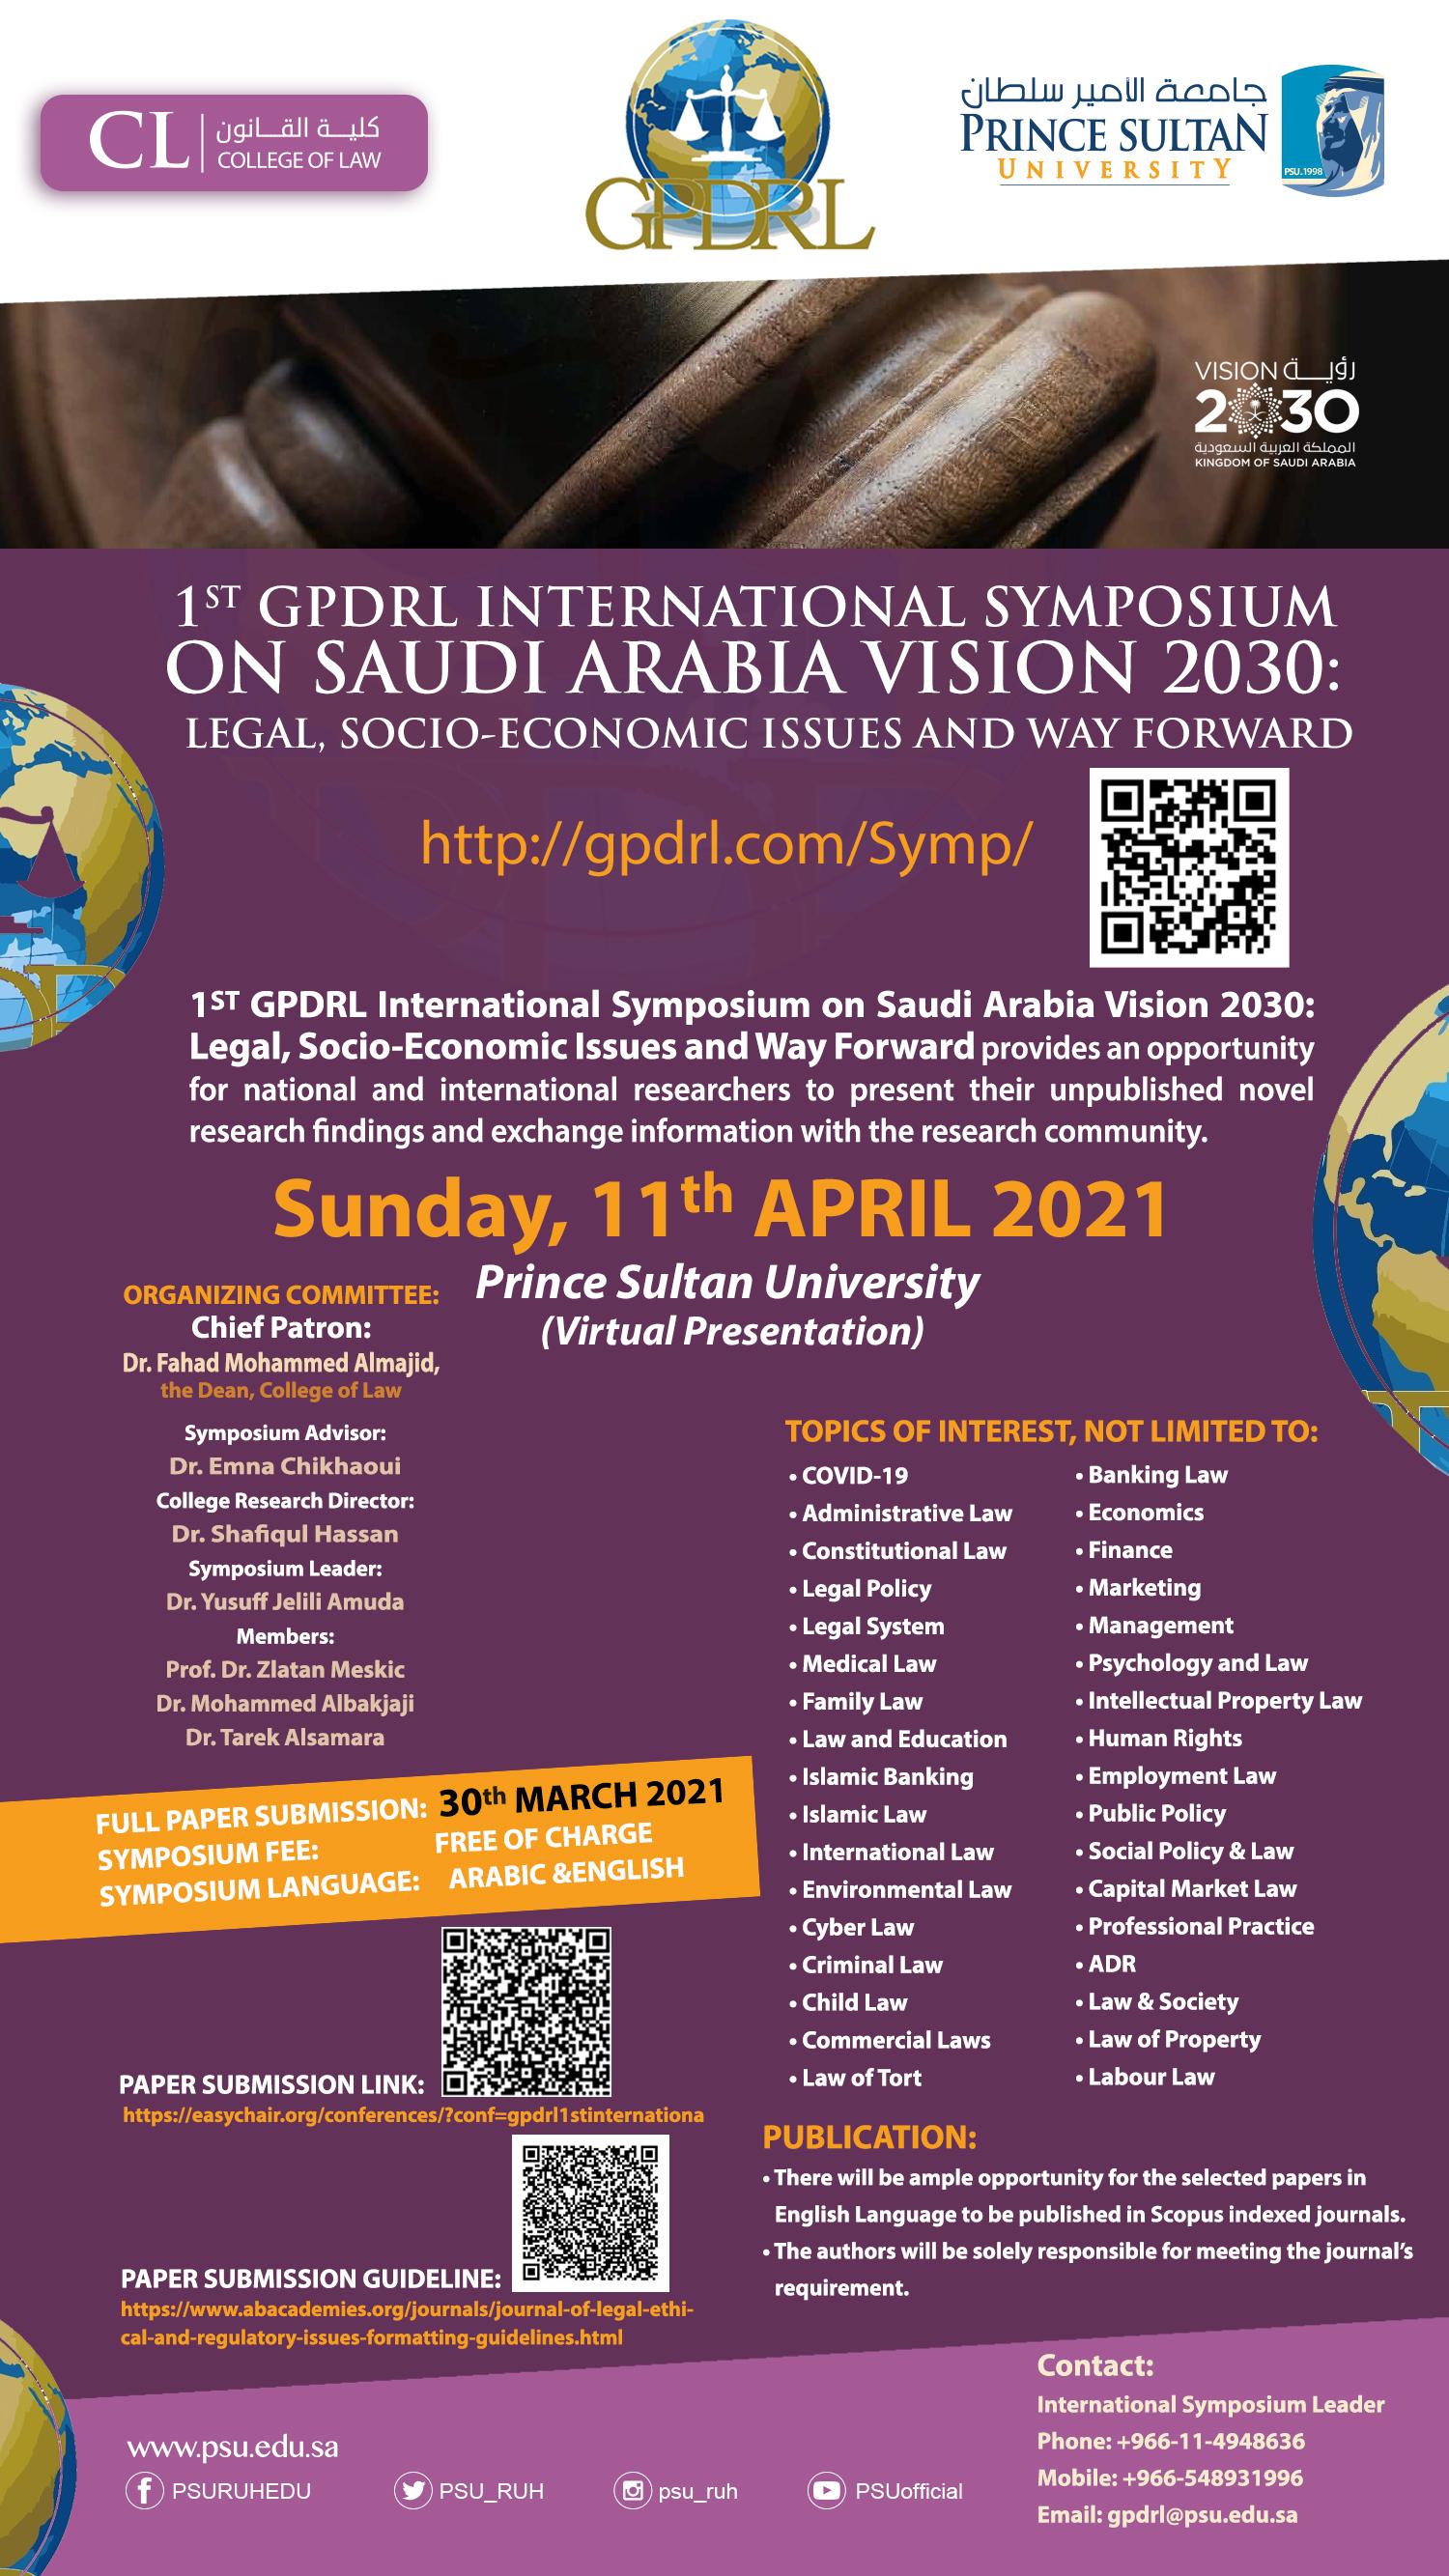 1st GDPRL International Symposium on Saudi Arabia VISION 2030 : Legal, Socio-economic issues and way forward